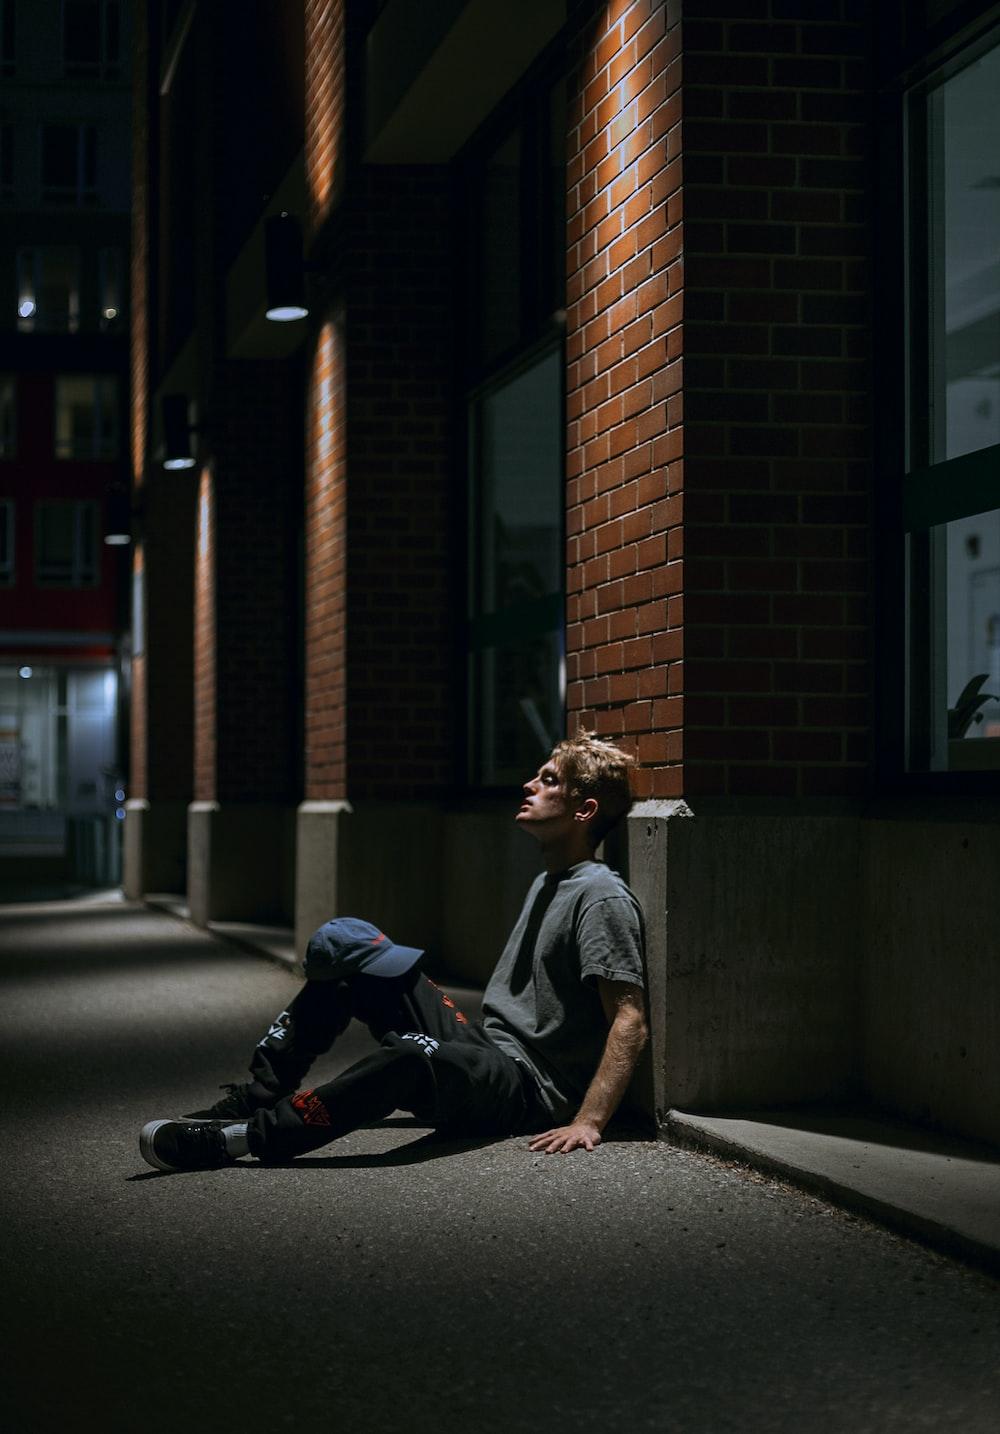 man in gray crew neck t-shirt sitting on sidewalk during daytime